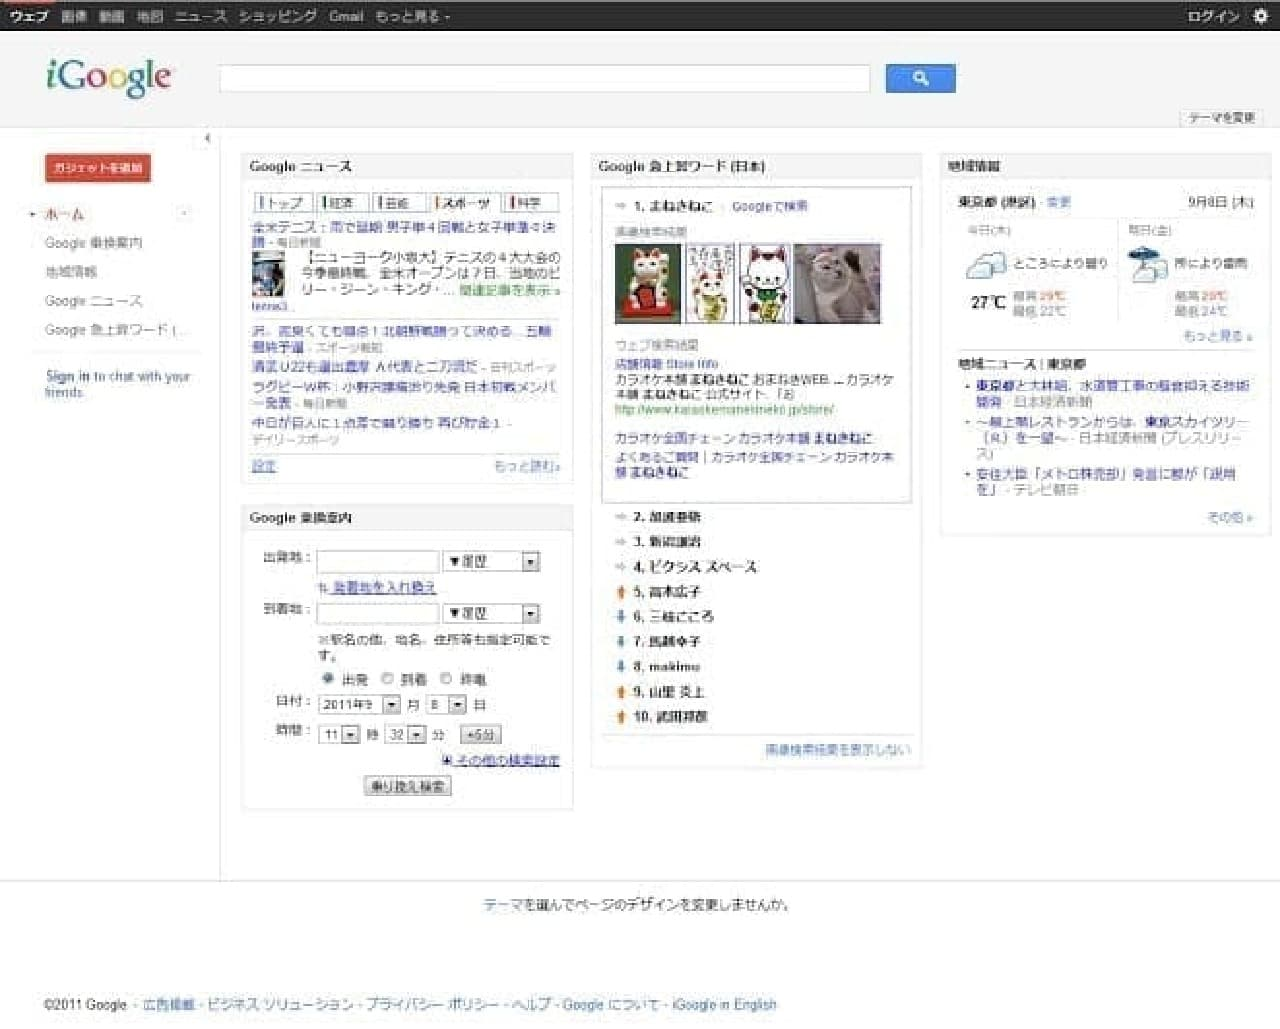 iGoogleのスクリーンショット